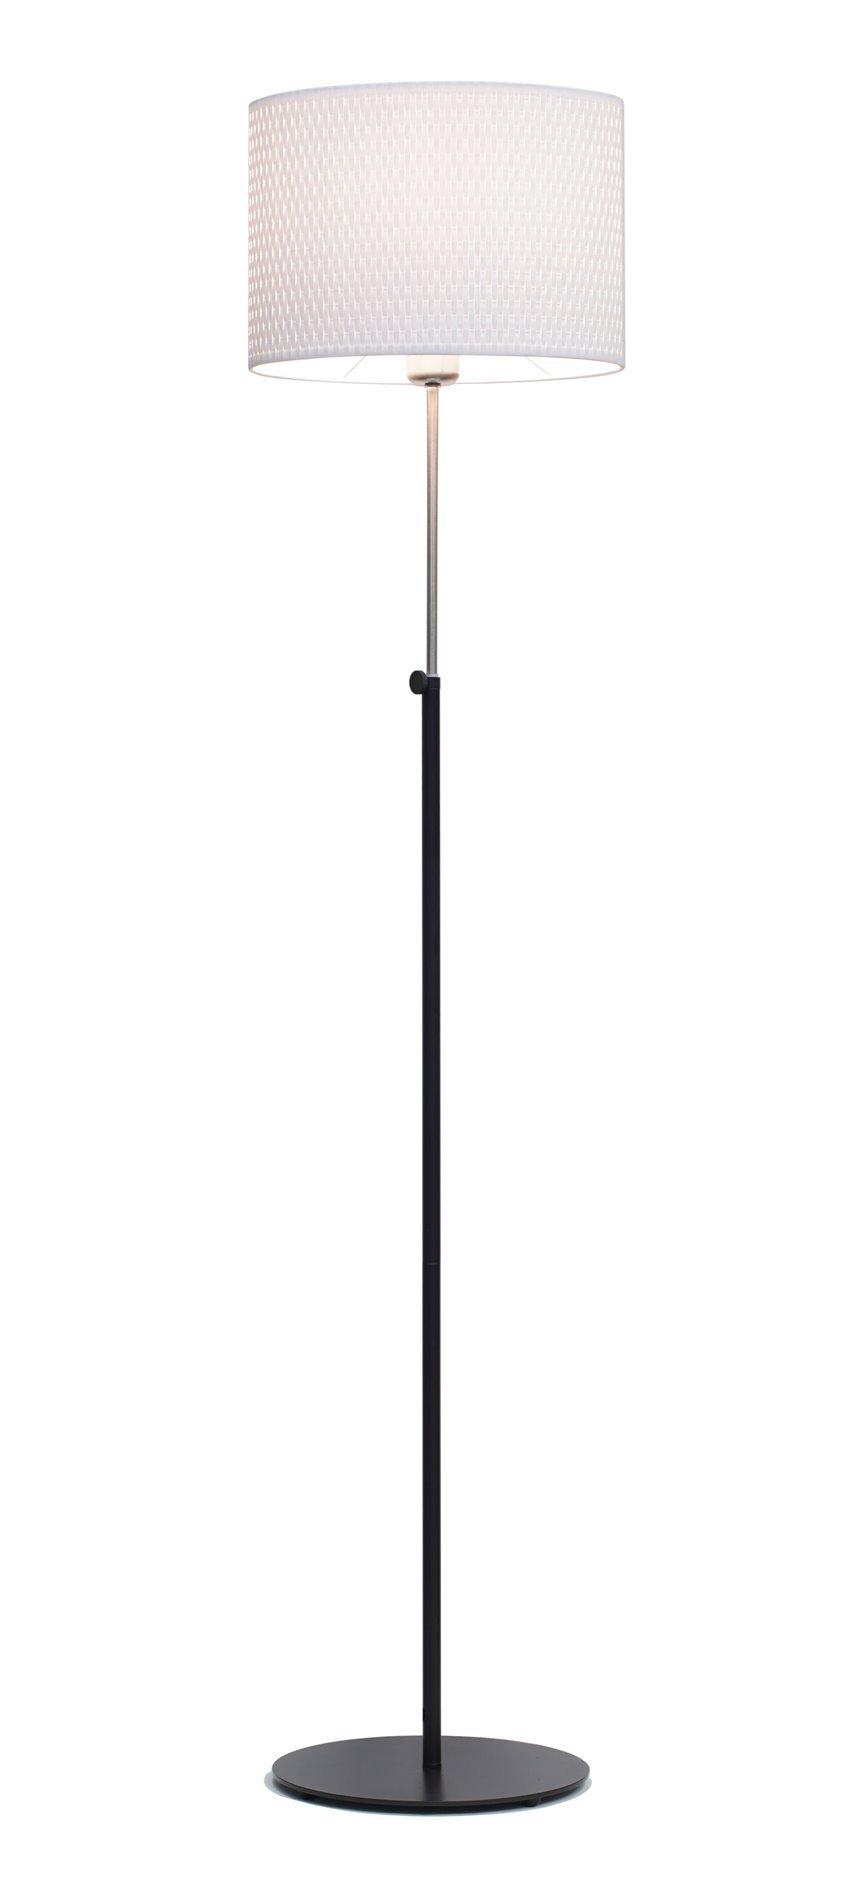 Revel Hampton 62.5'' Minimalist Floor Lamp + White Woven Oval Paper Shade, Adjustable Height, 2-Tone Finish: Brushed Nickel + Black